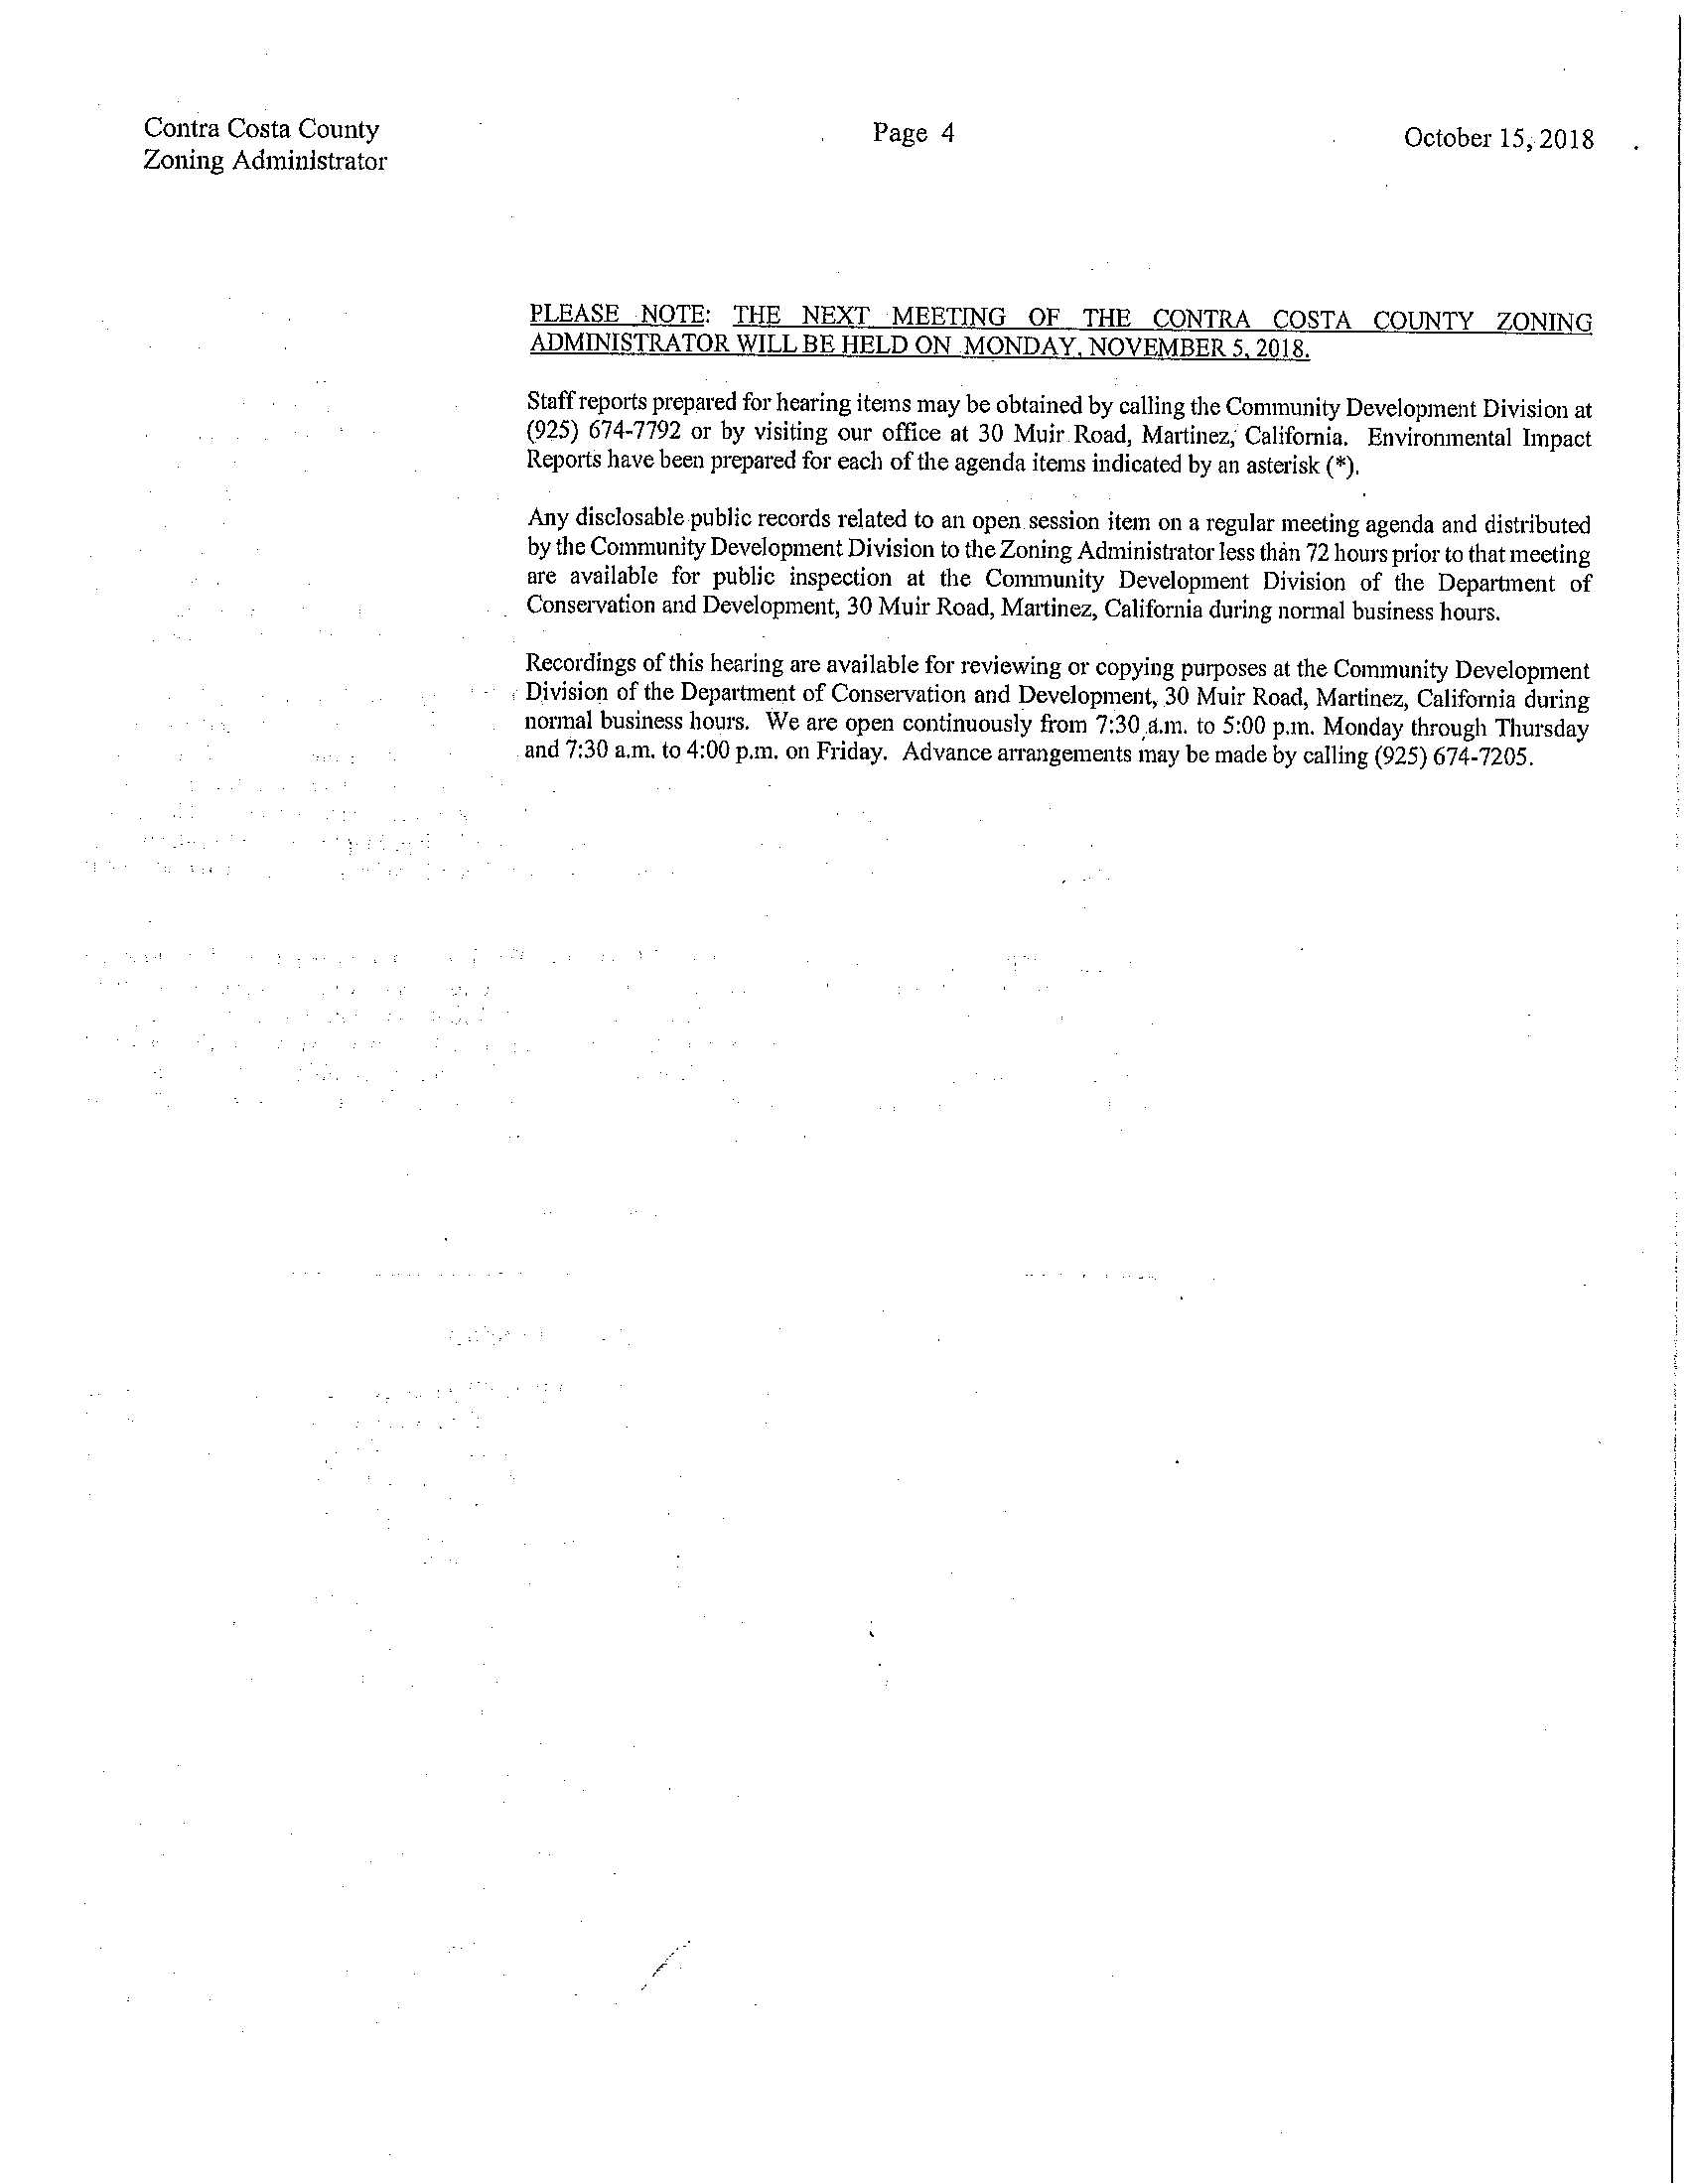 ESMAC Agenda 11.14.2018 (46 Pages)_43.jpg